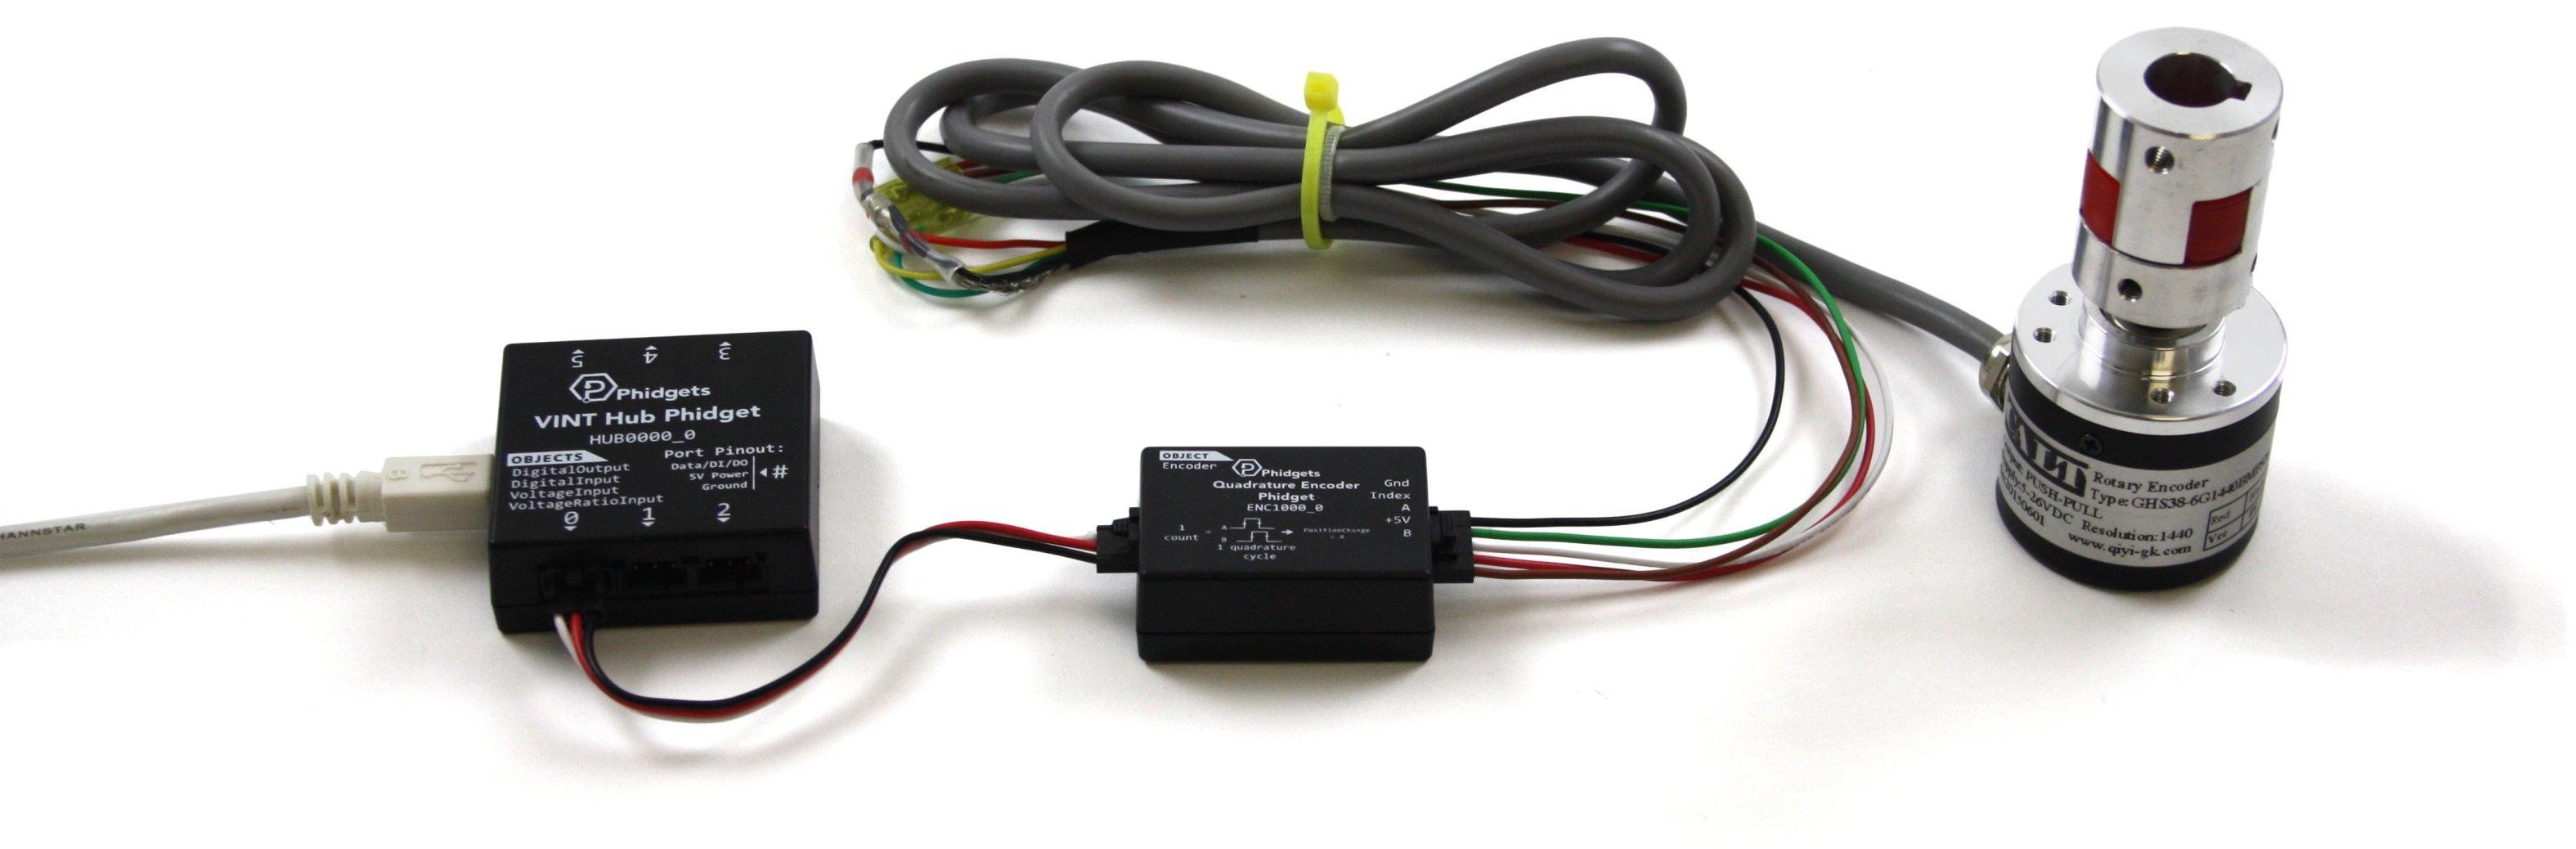 Quadrature Encoder Phidget - ENC1000_0 at Phidgets